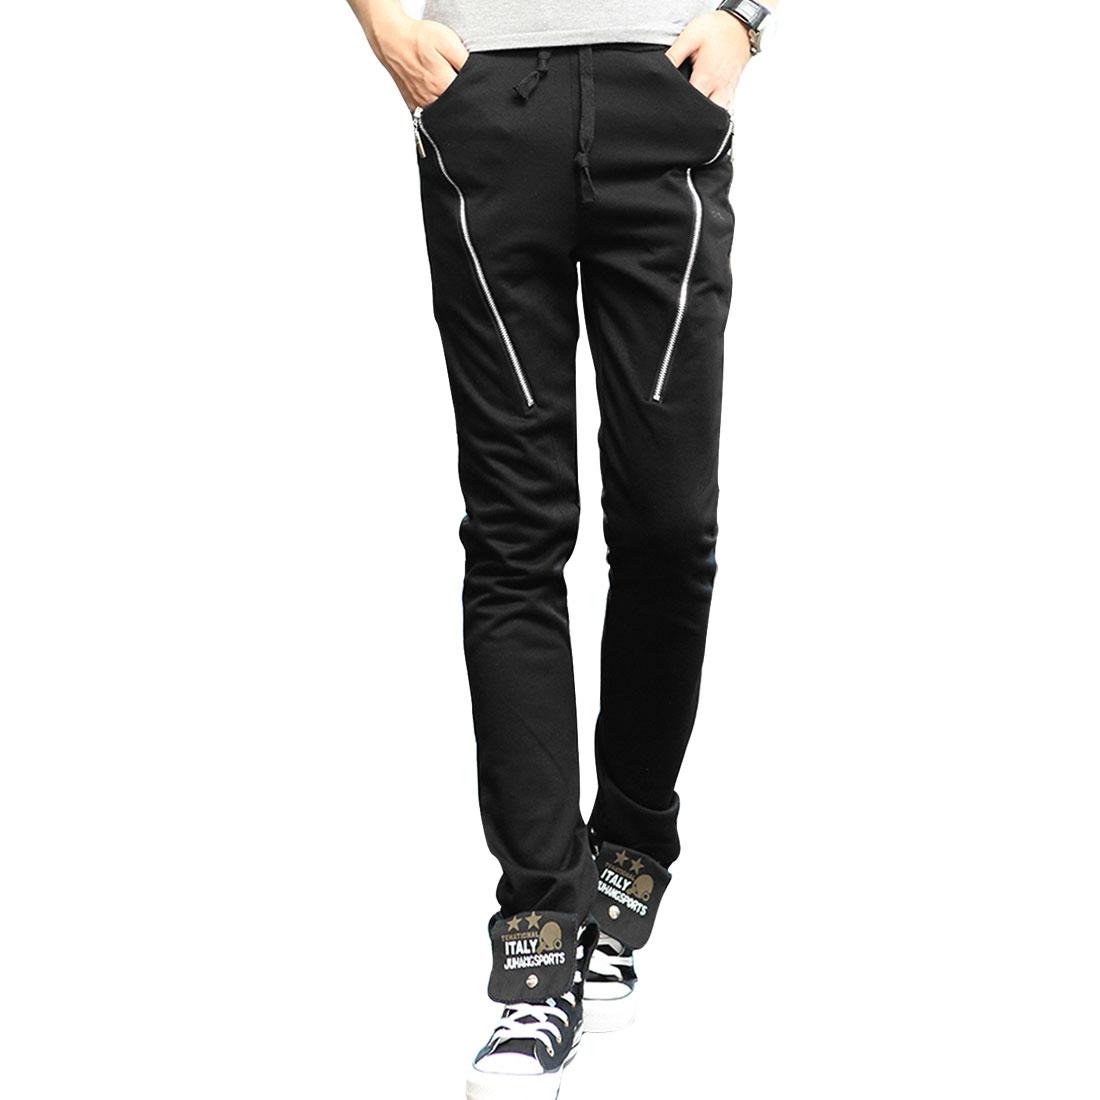 Man Elastic Waist Mid Rise Two Front Top Pockets Zipper Decor Black Pants W30